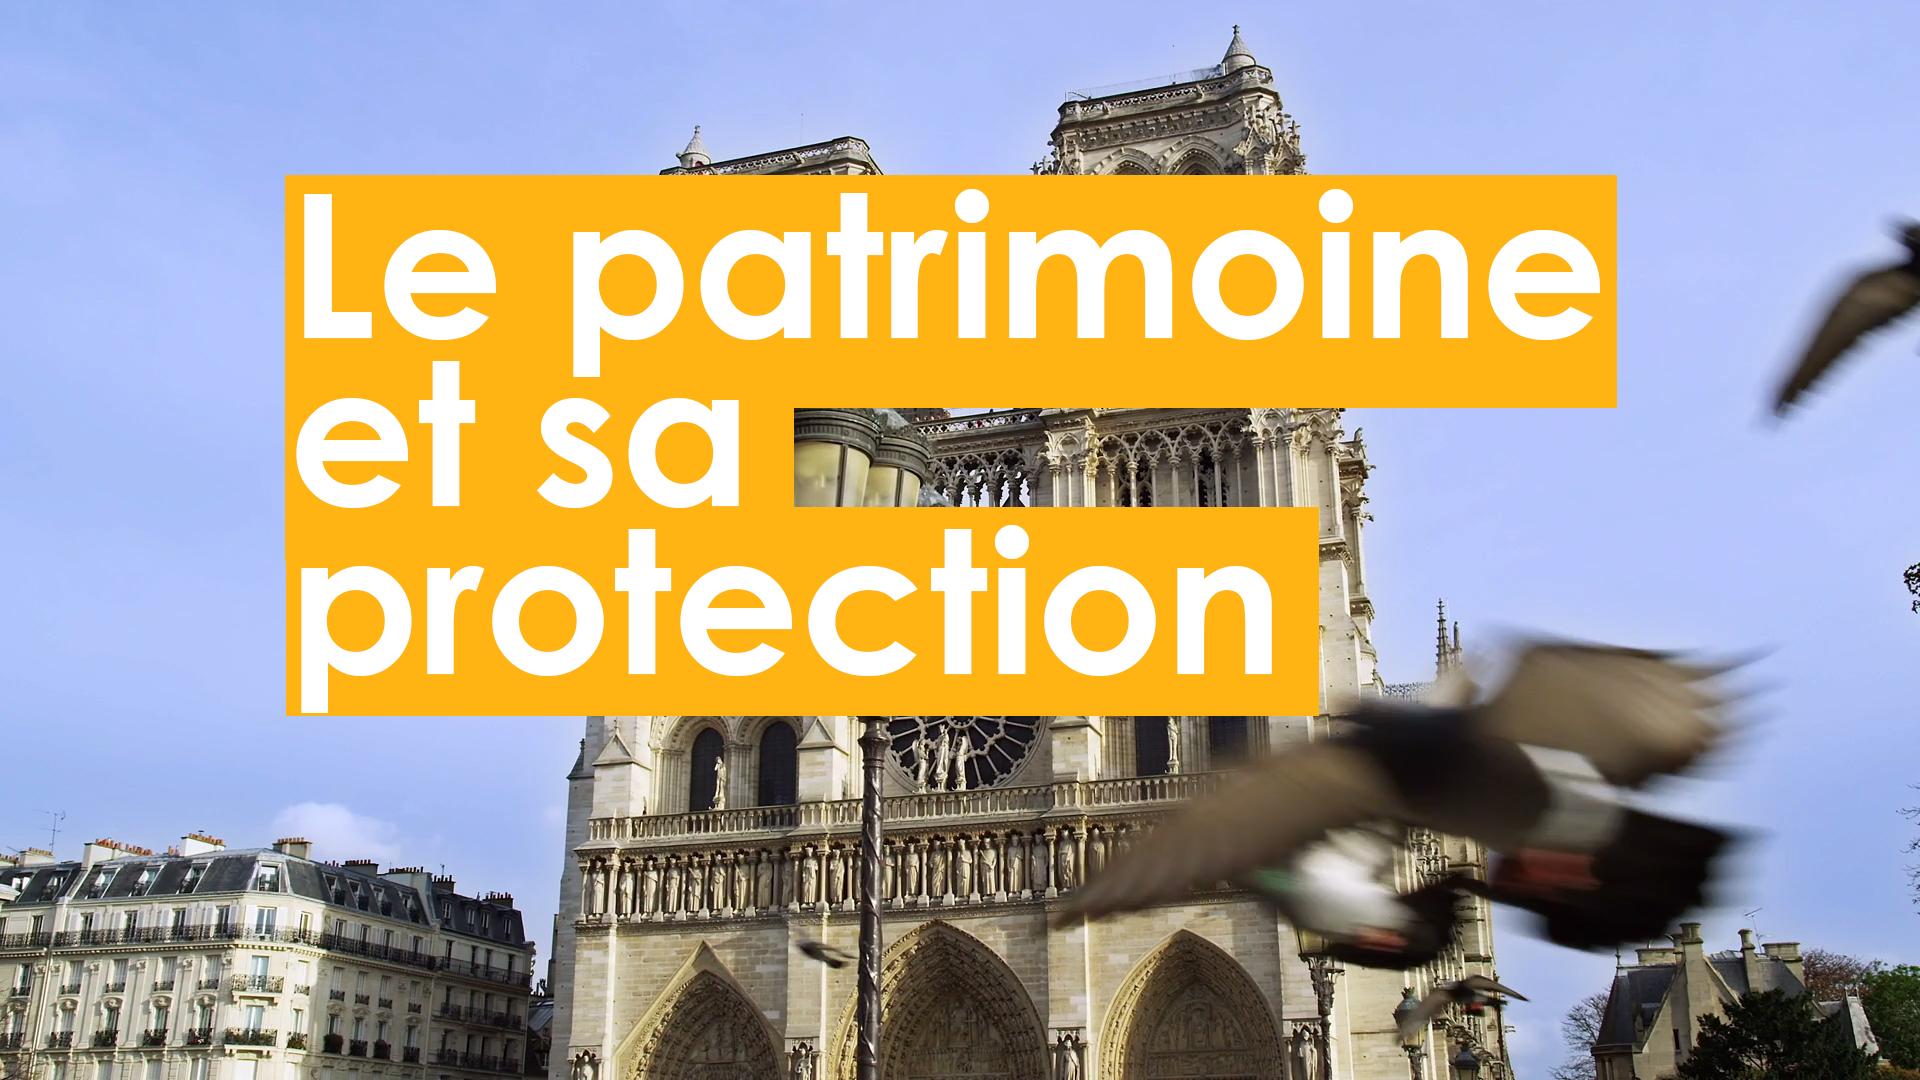 Le patrimoine et sa protection screenshot